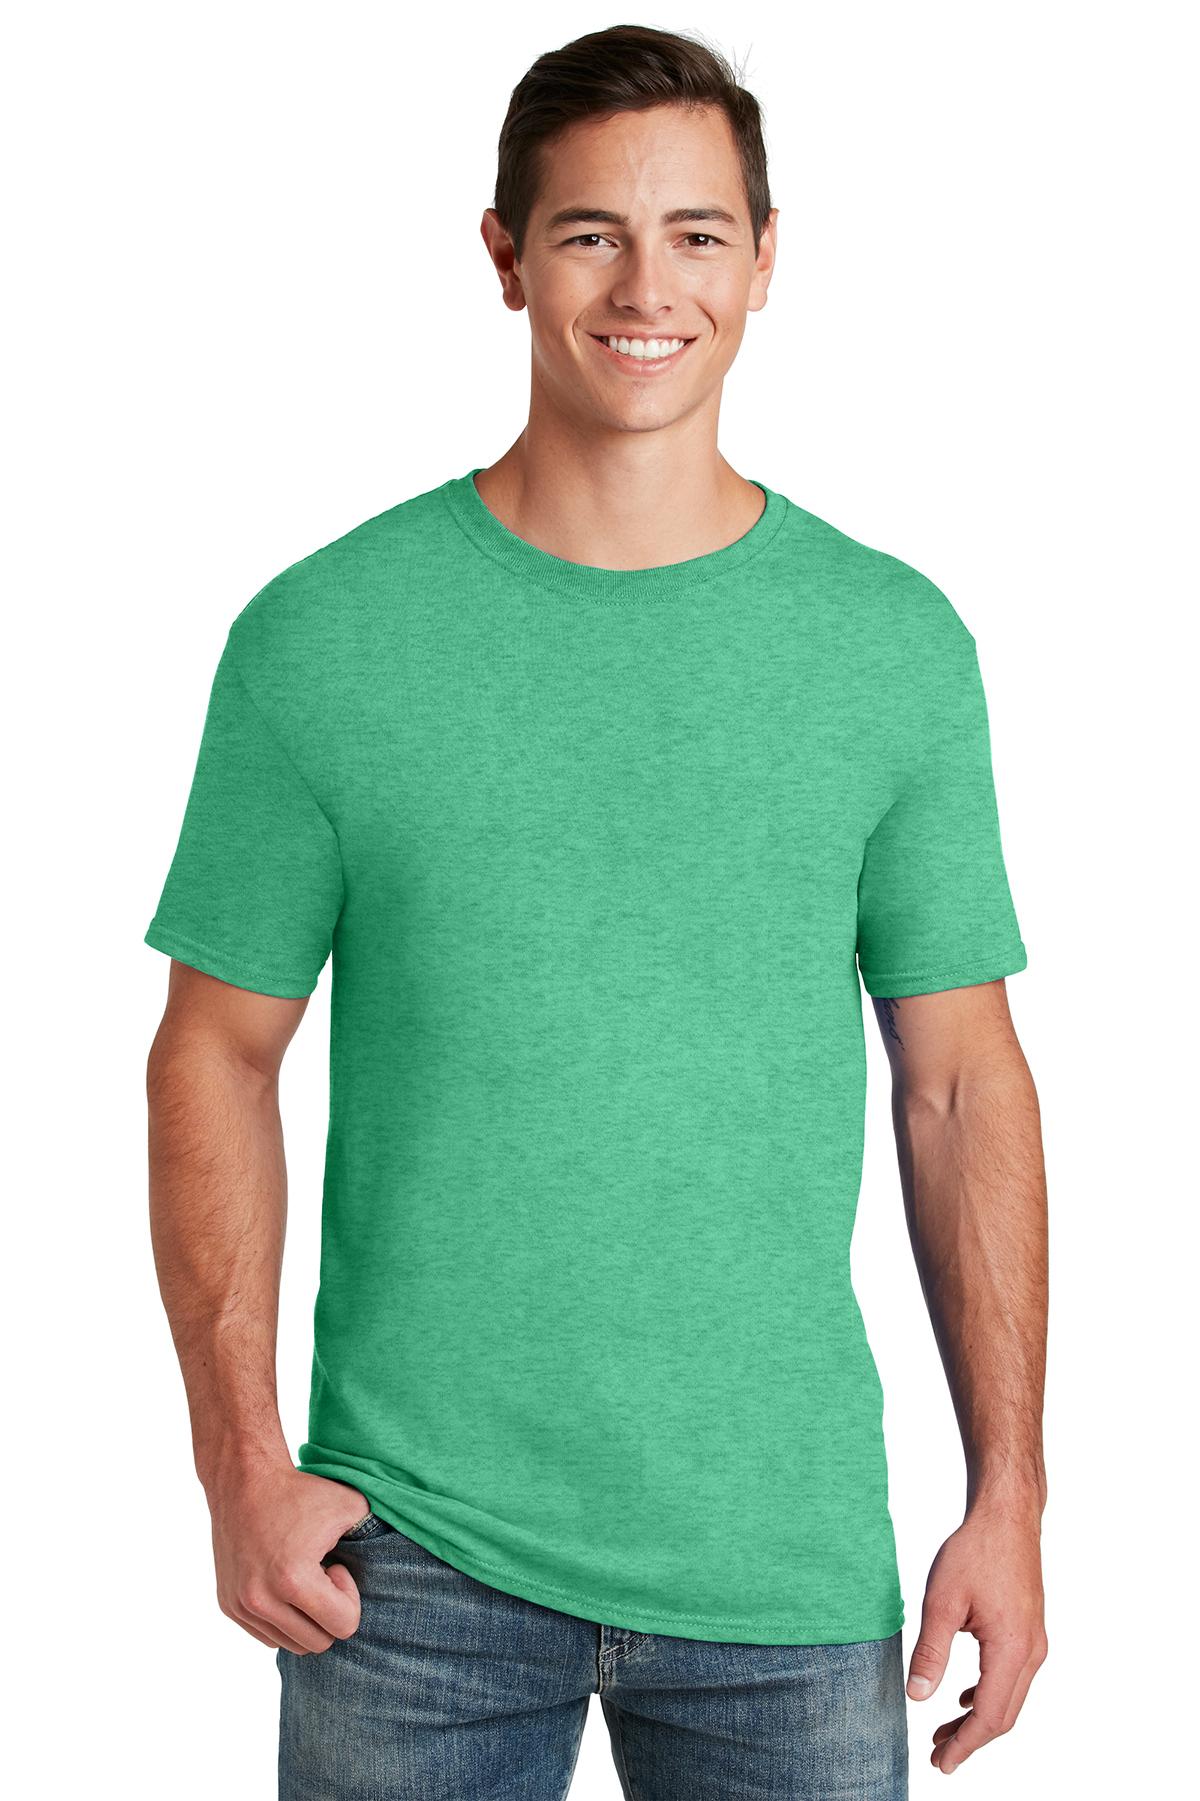 367ebcd0b0 Fruit of the Loom® HD Cotton™ 100% Cotton T-Shirt | 5-5.6 100 ...